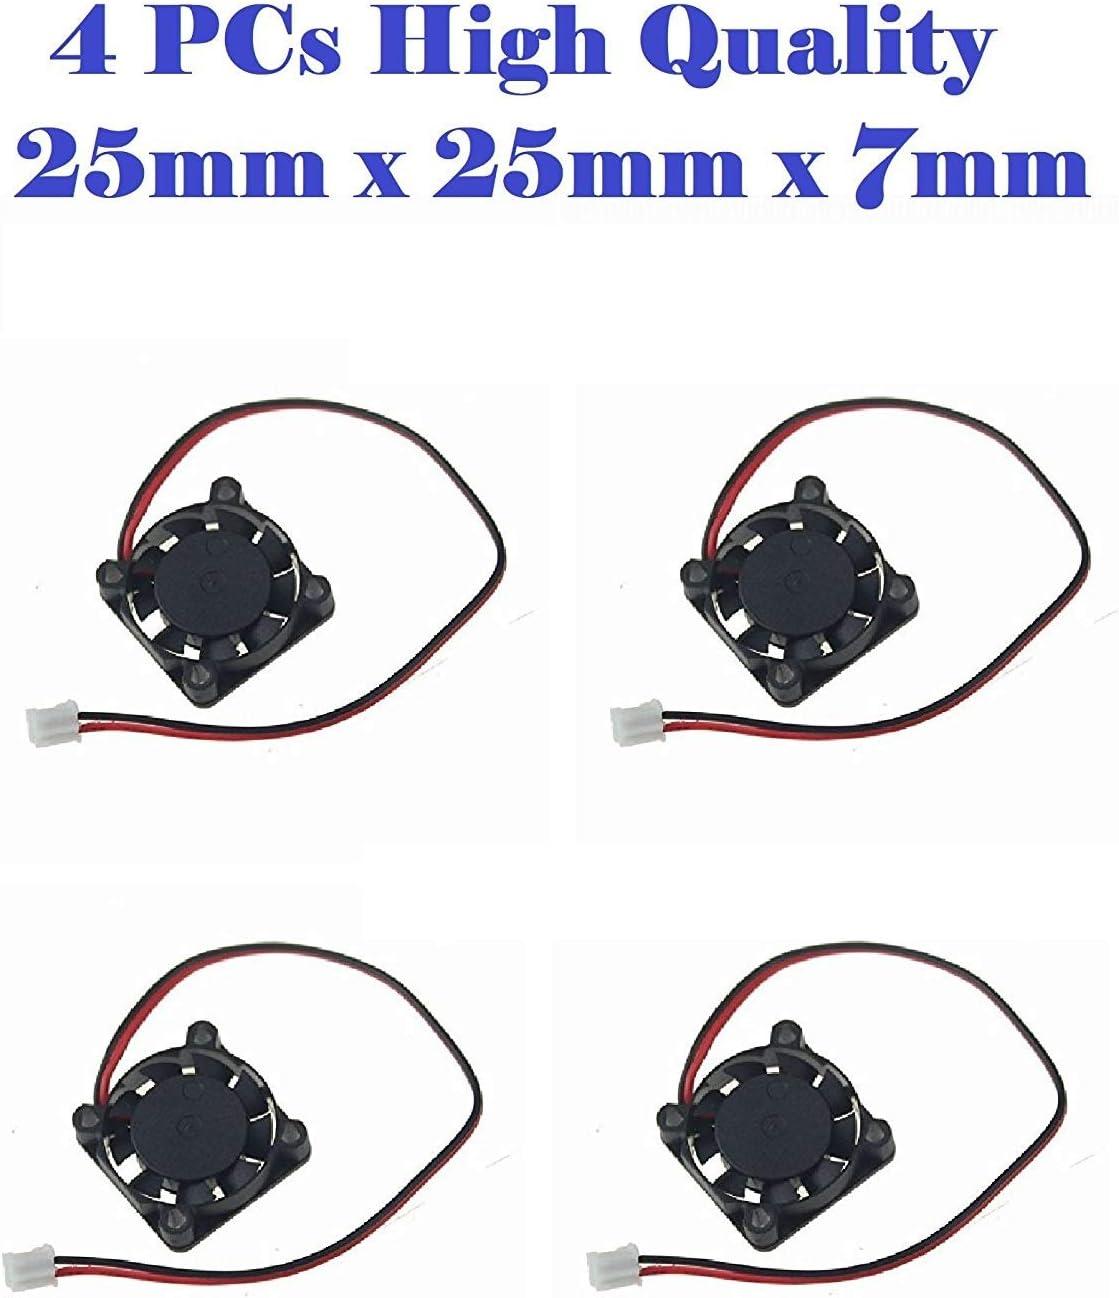 4-Packs 25mm x 25mm x 7mm 12000 RPM DC 12V Small Mini Brushless Cooling Fan